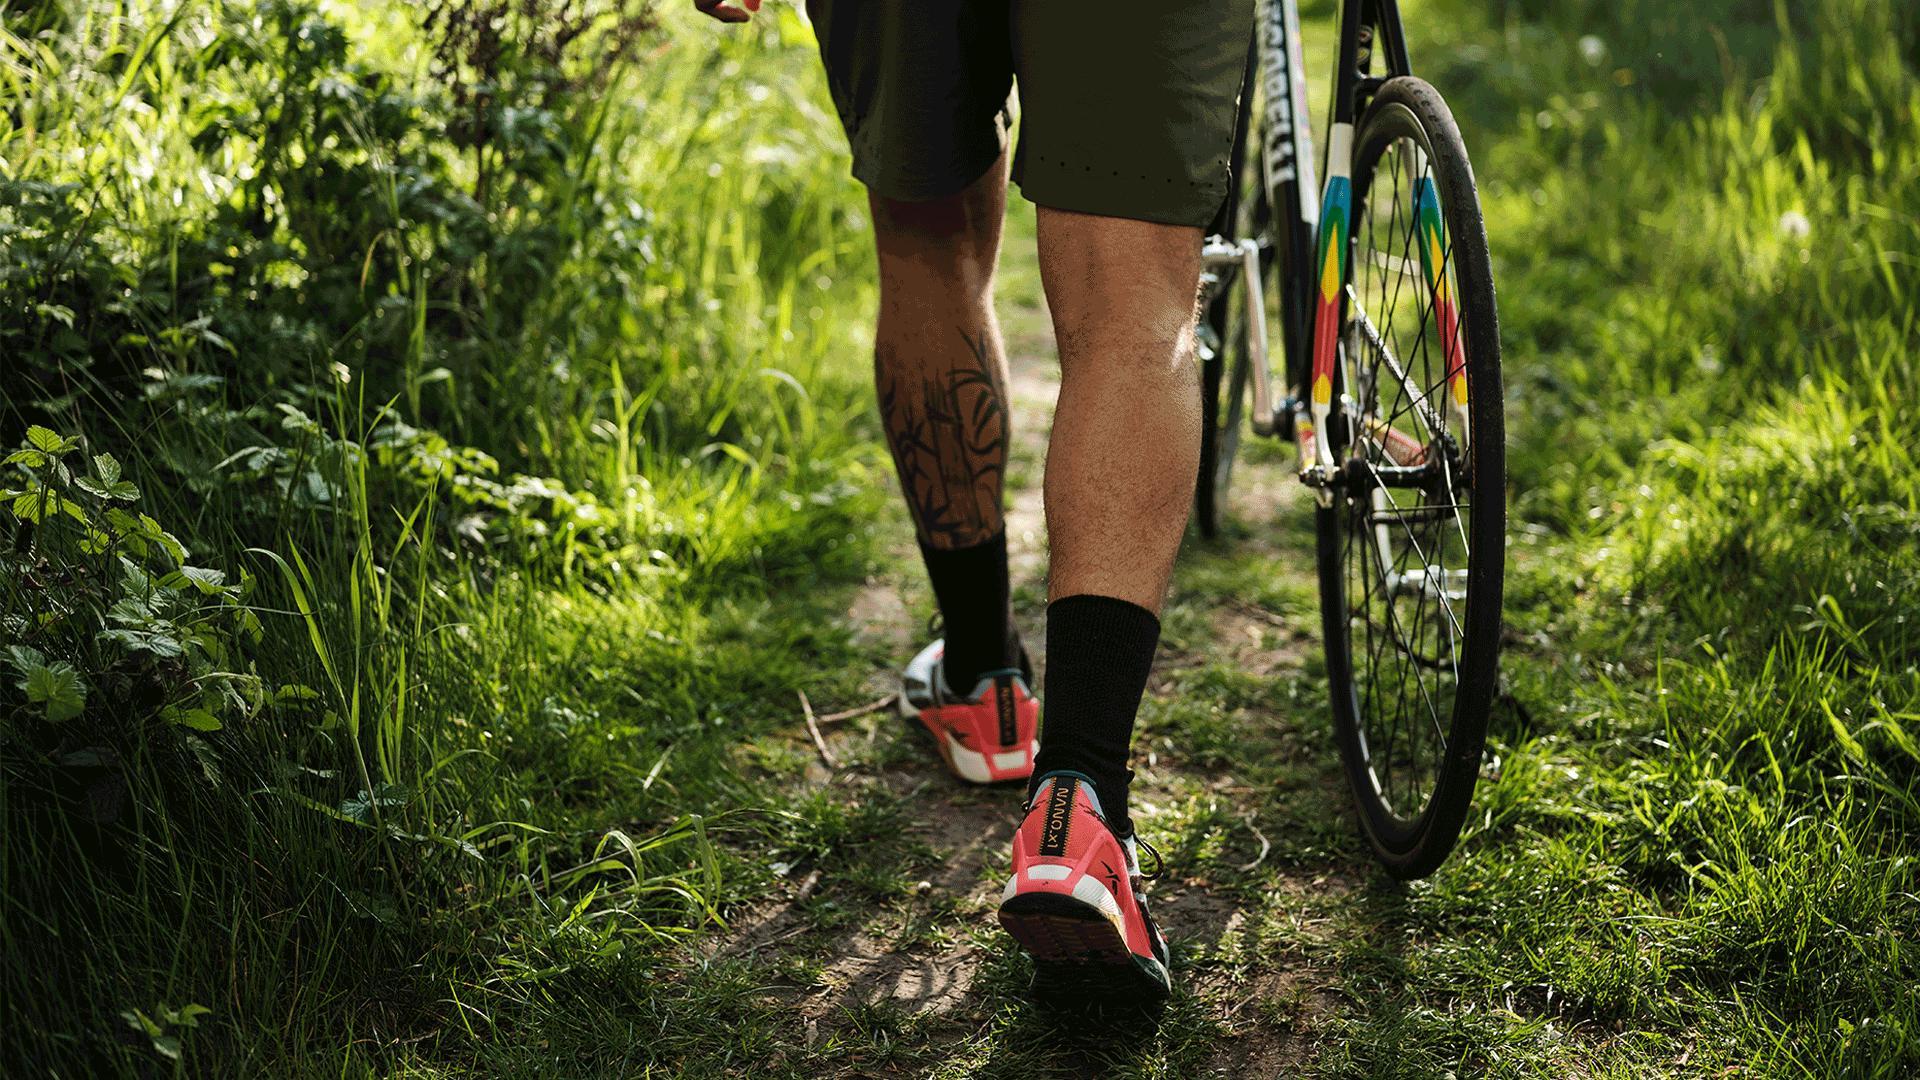 Reebok's Nano X1 Adventure training shoe | Walking with a bicycle